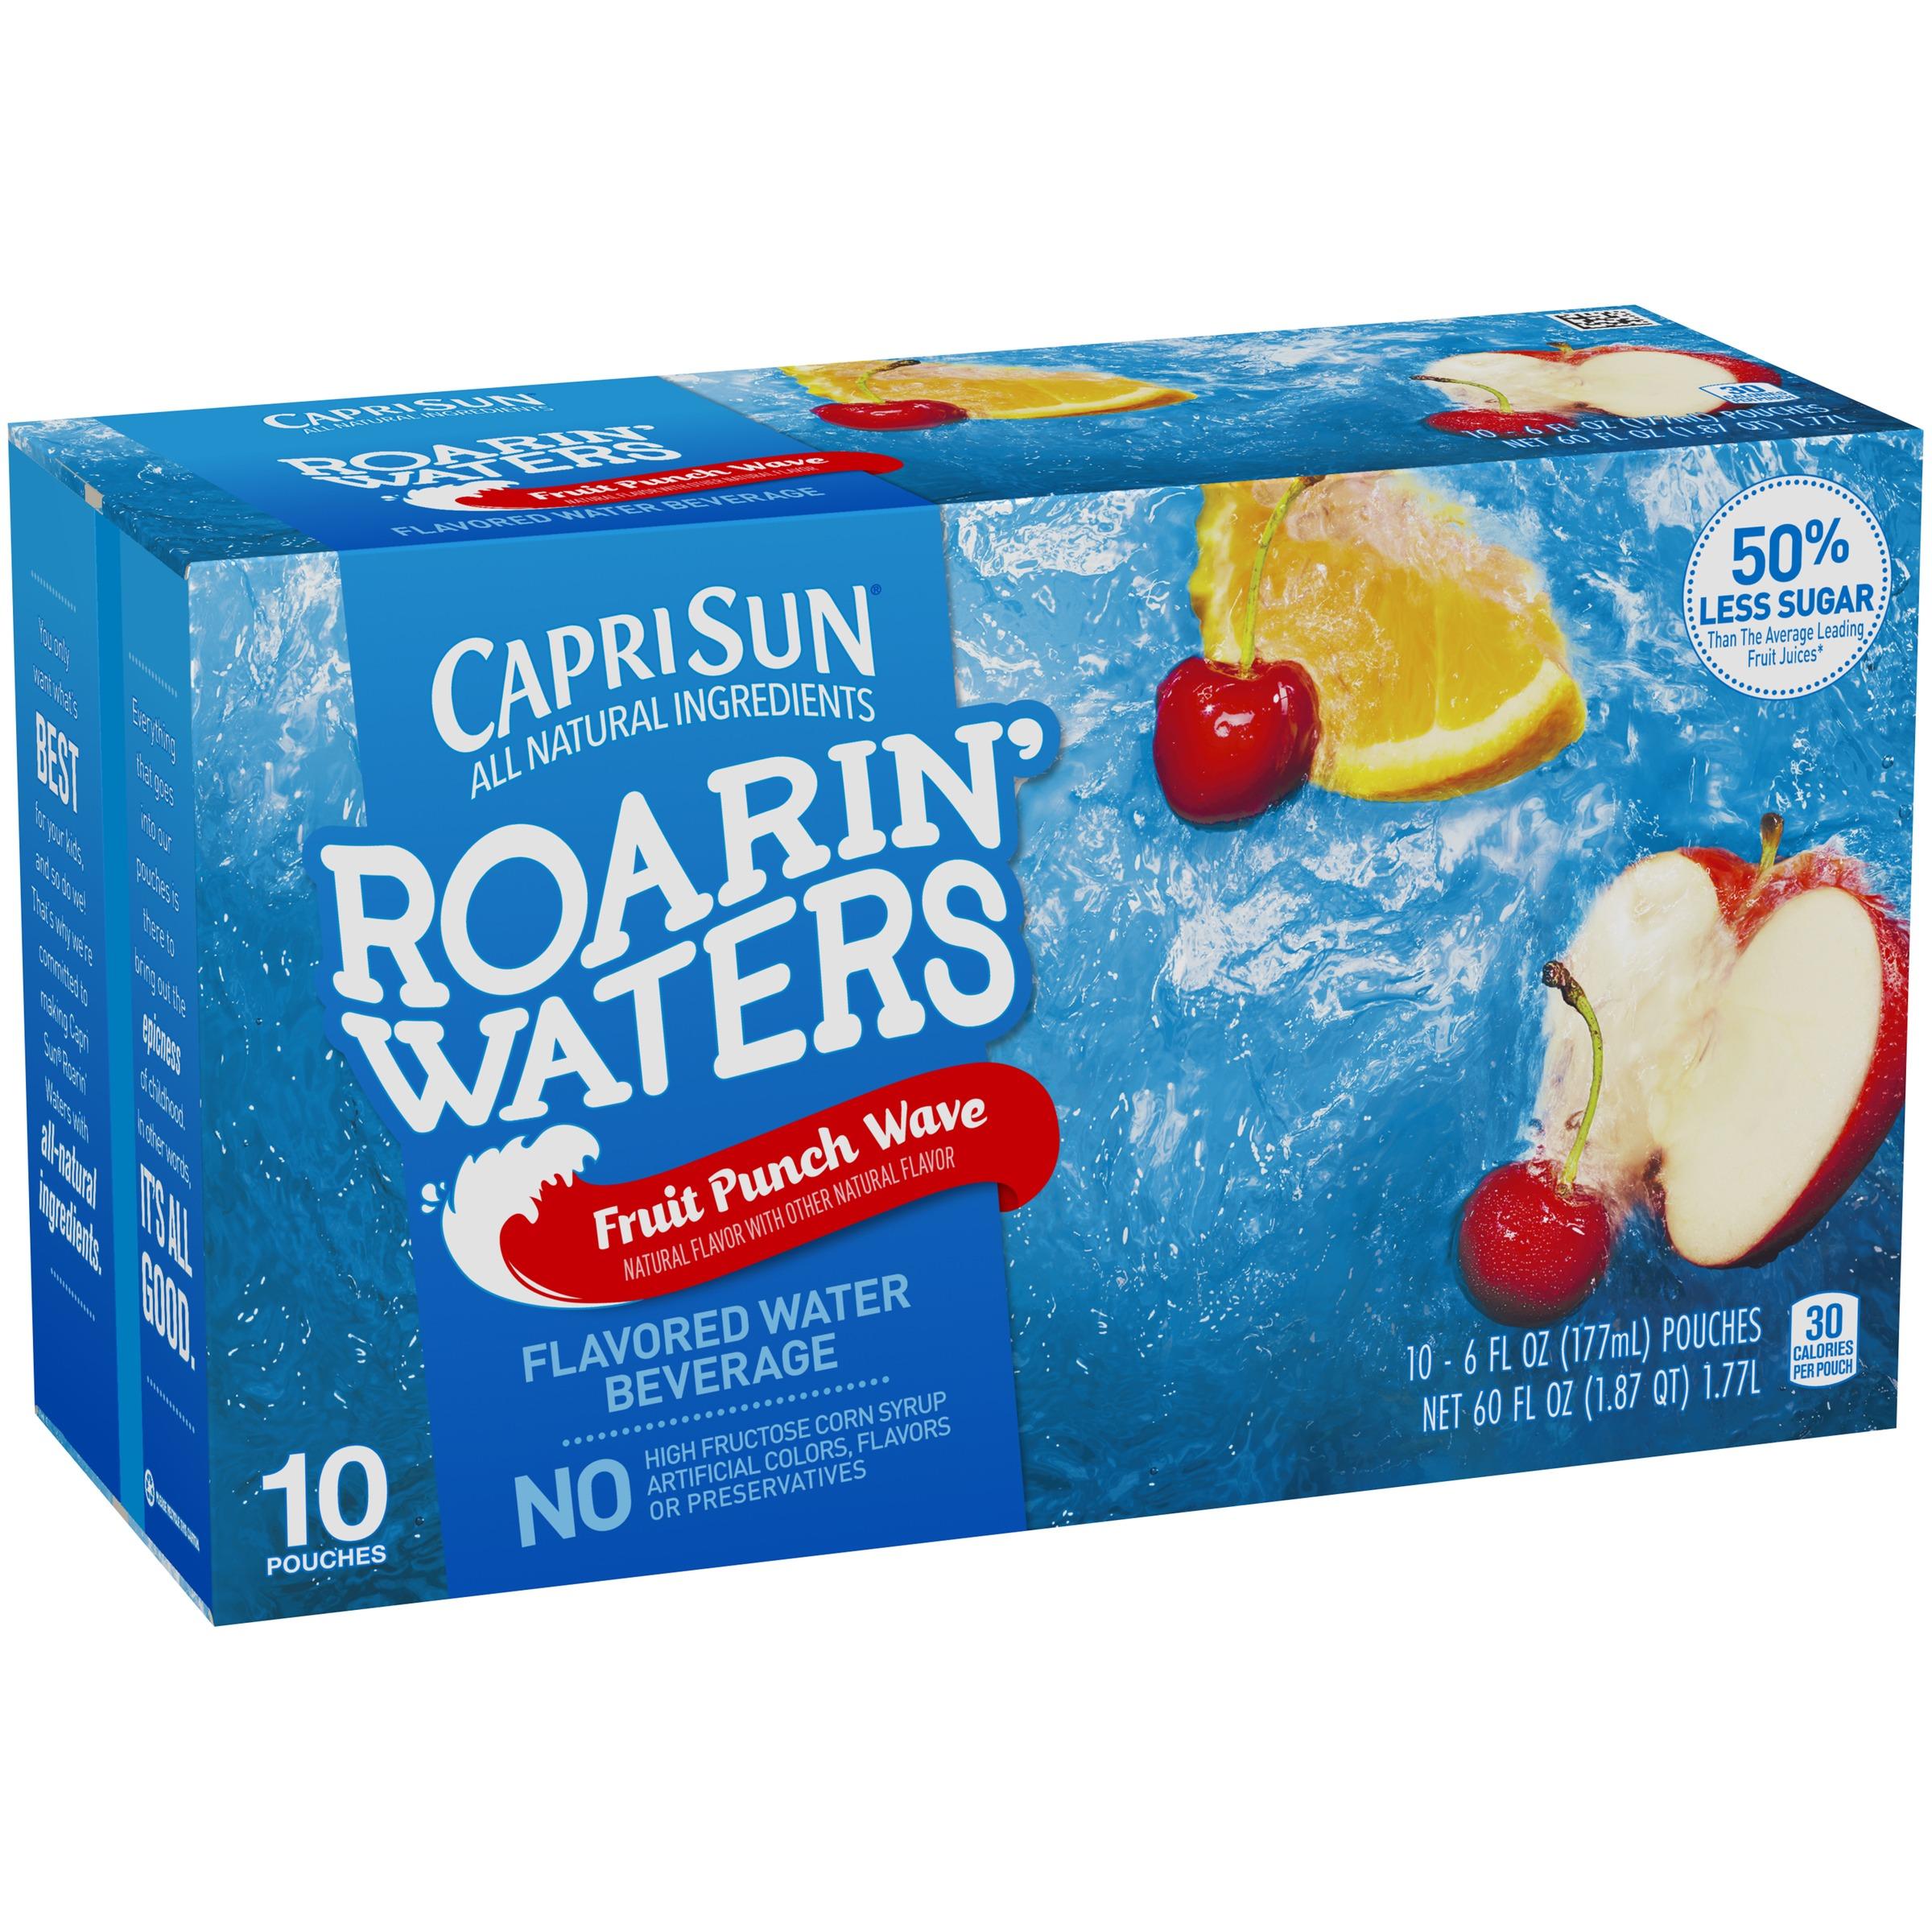 Capri Sun® Roarin' Waters Fruit Punch Wave Flavored Water Beverage 10-6 fl. oz. Pouches